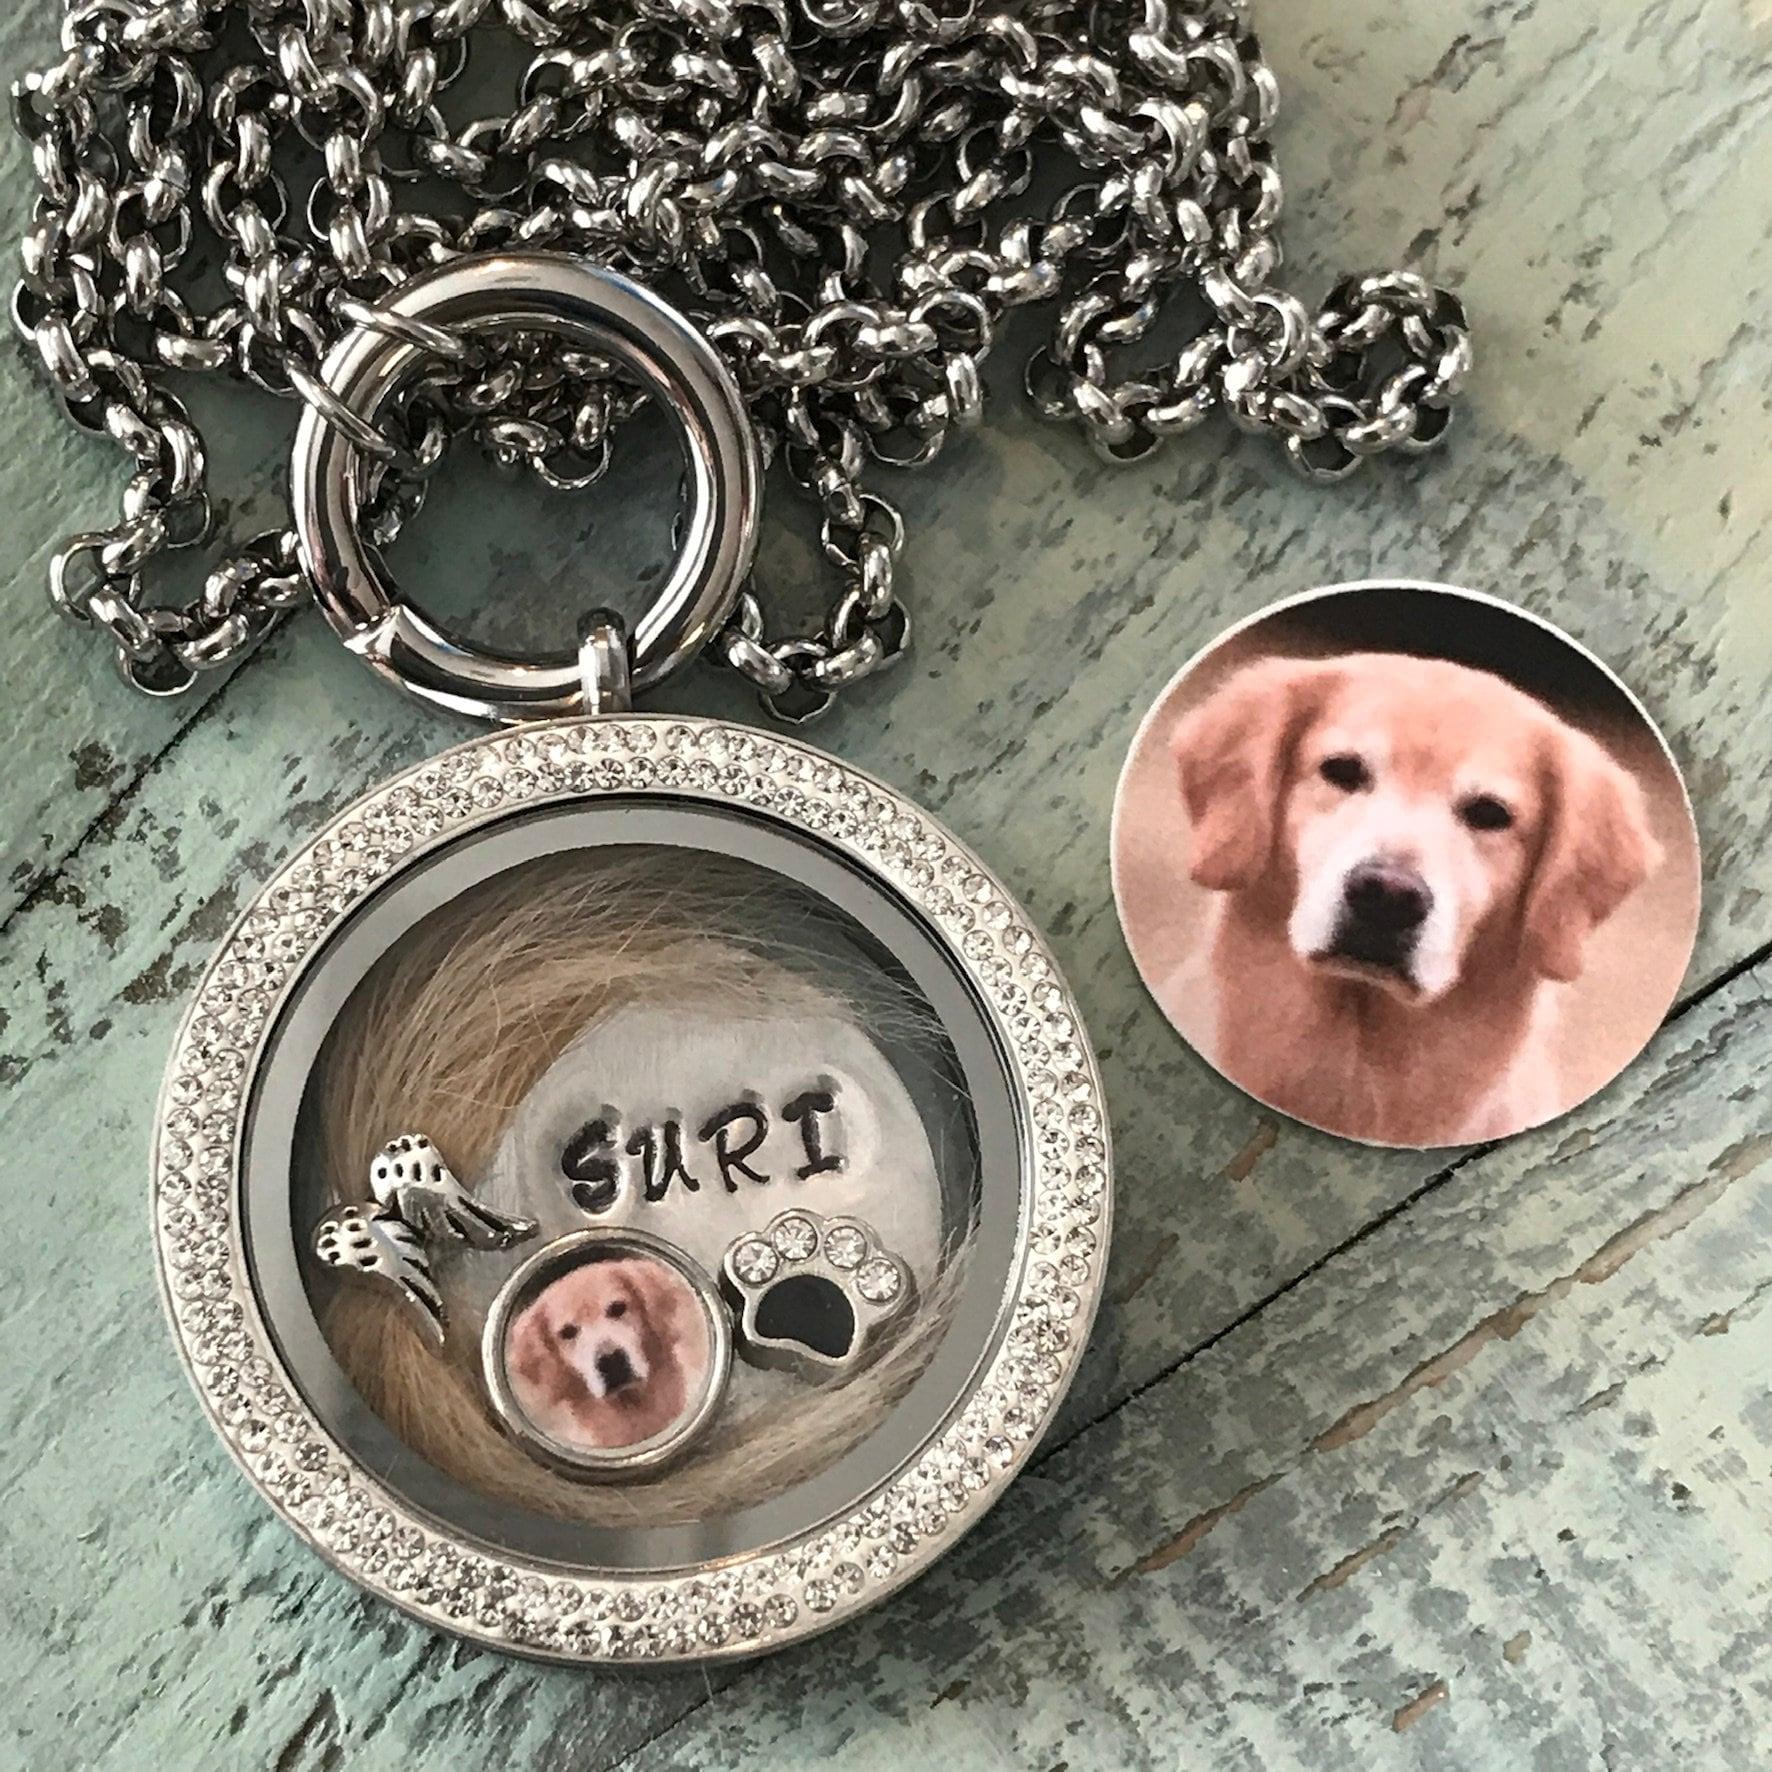 Pet Memorial gift God Bless You Necklace Glass Heart Locket Fur Photos Pet Keepsake Vintage Lock of Fur Necklace Pet Loss Necklace